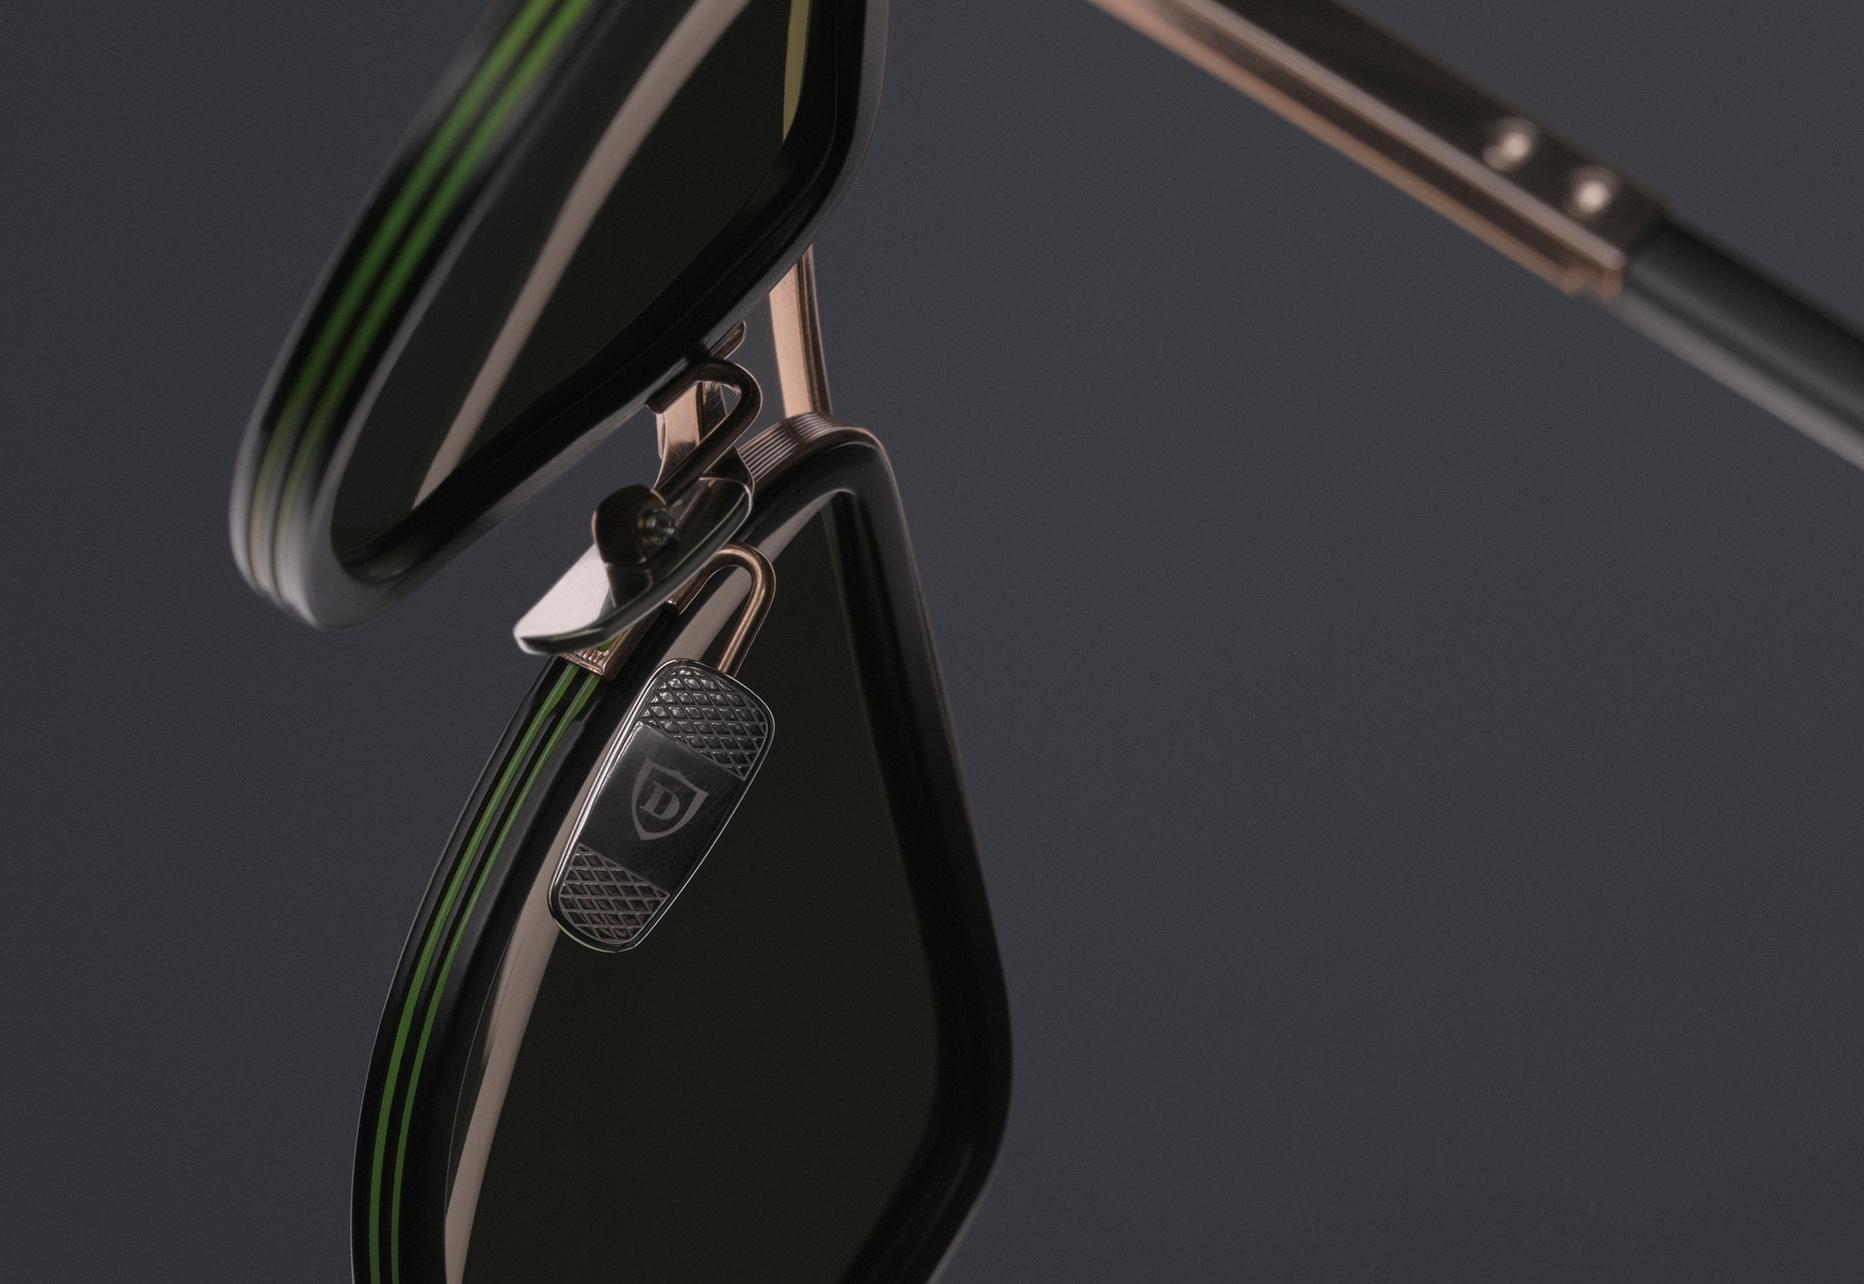 DITA MACH-S Titanium nose pads with diamond pressed detail